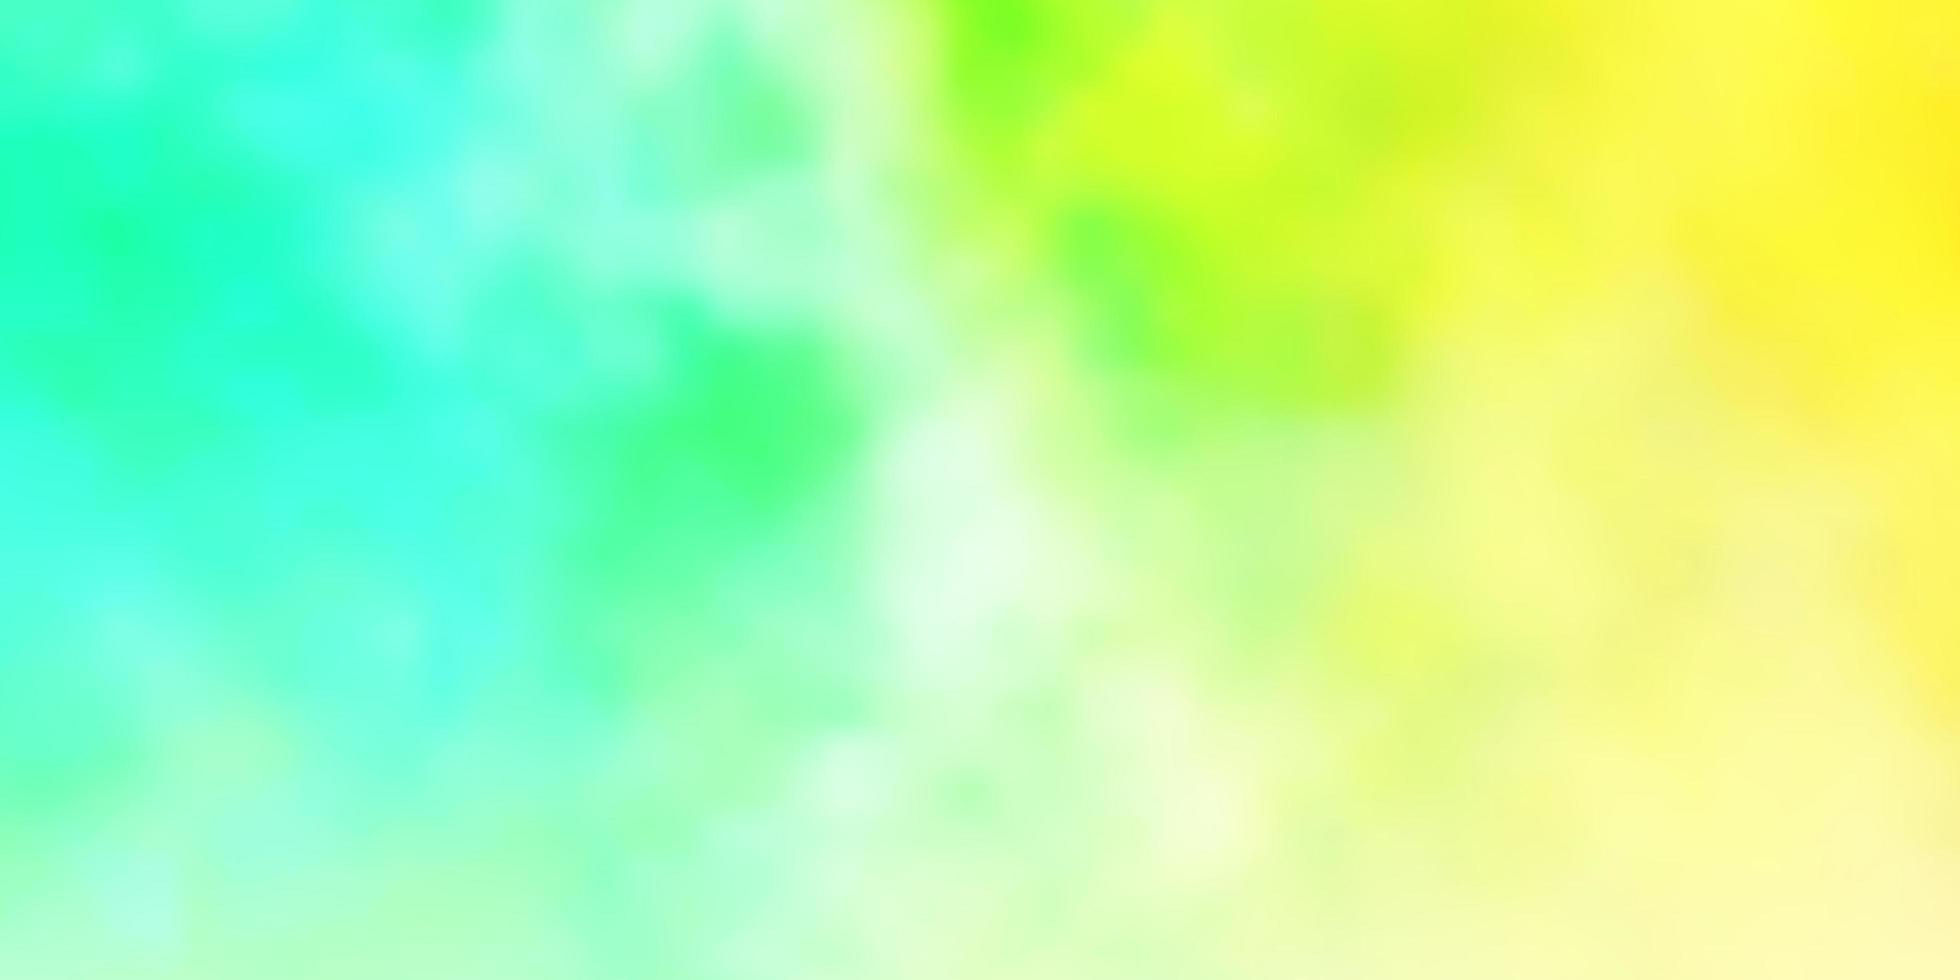 lichtgroene, gele vectorlay-out met cloudscape. vector